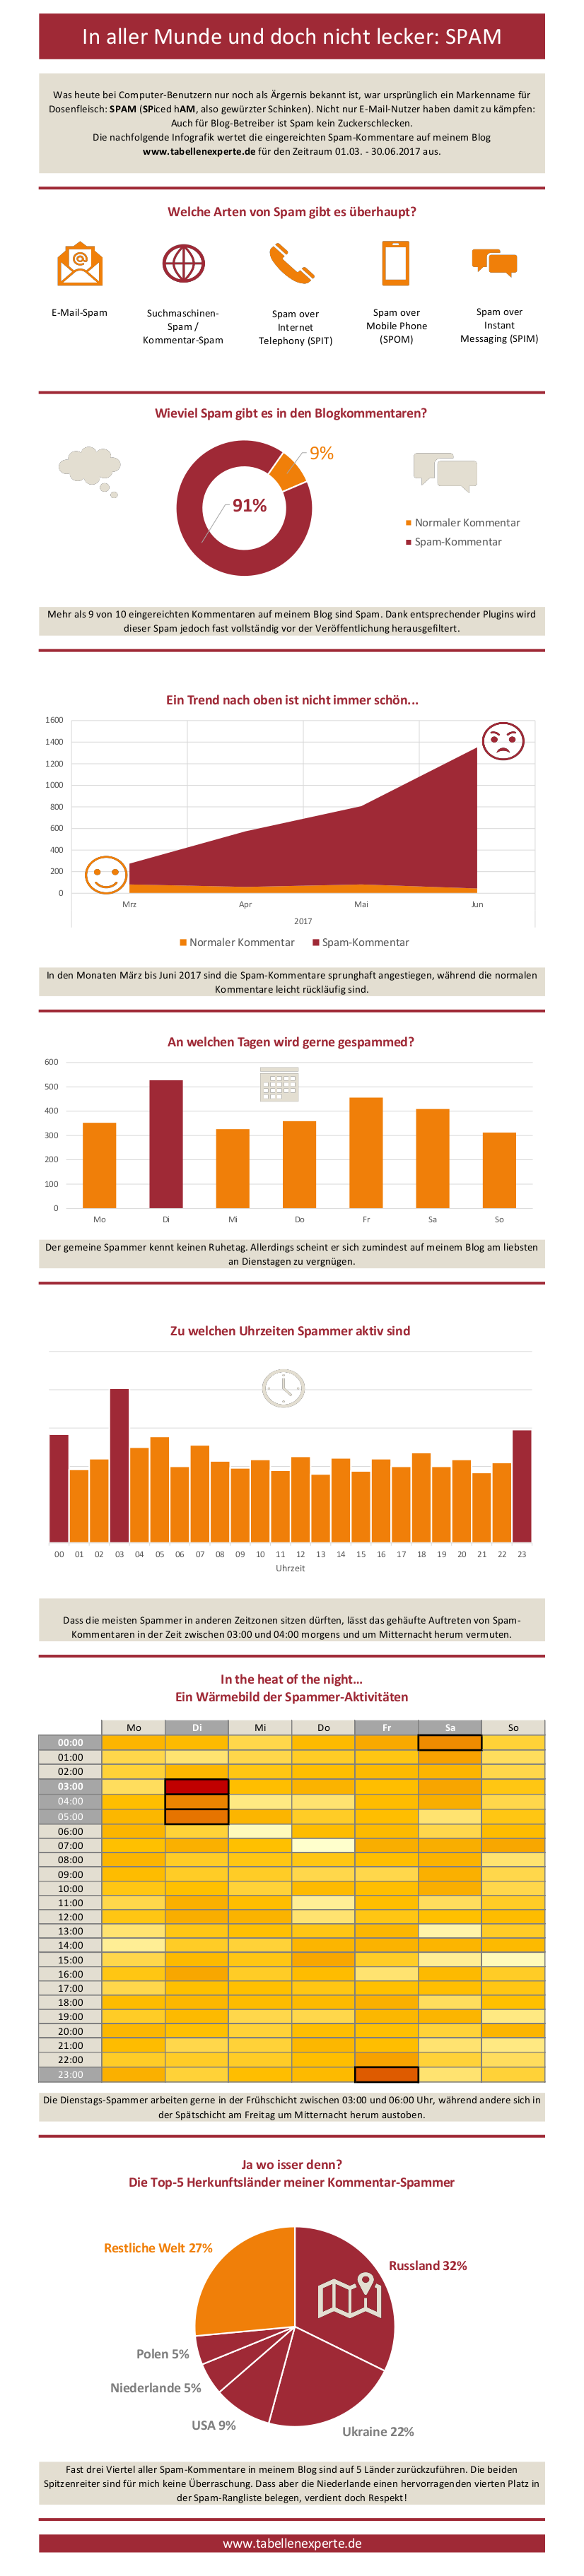 Infografik Kommentar-Spam